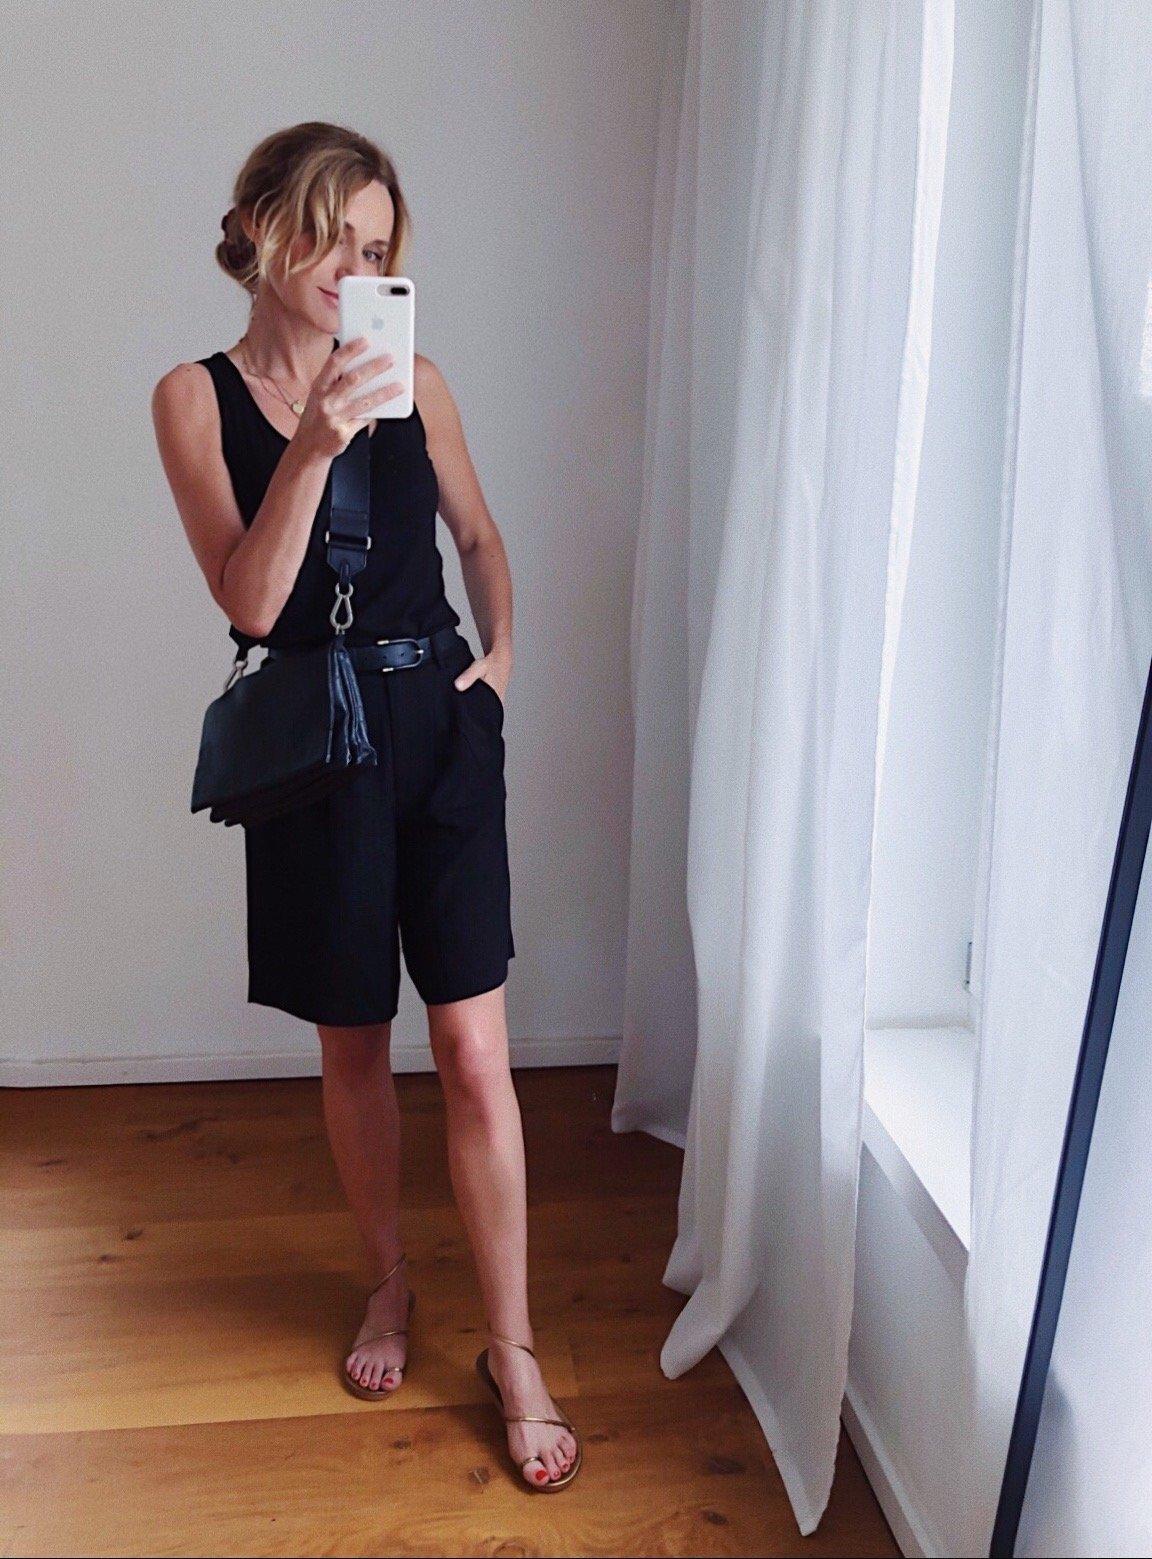 Bermuda-Shorts-Outfit-casual Nowshine-Blog-ü-40